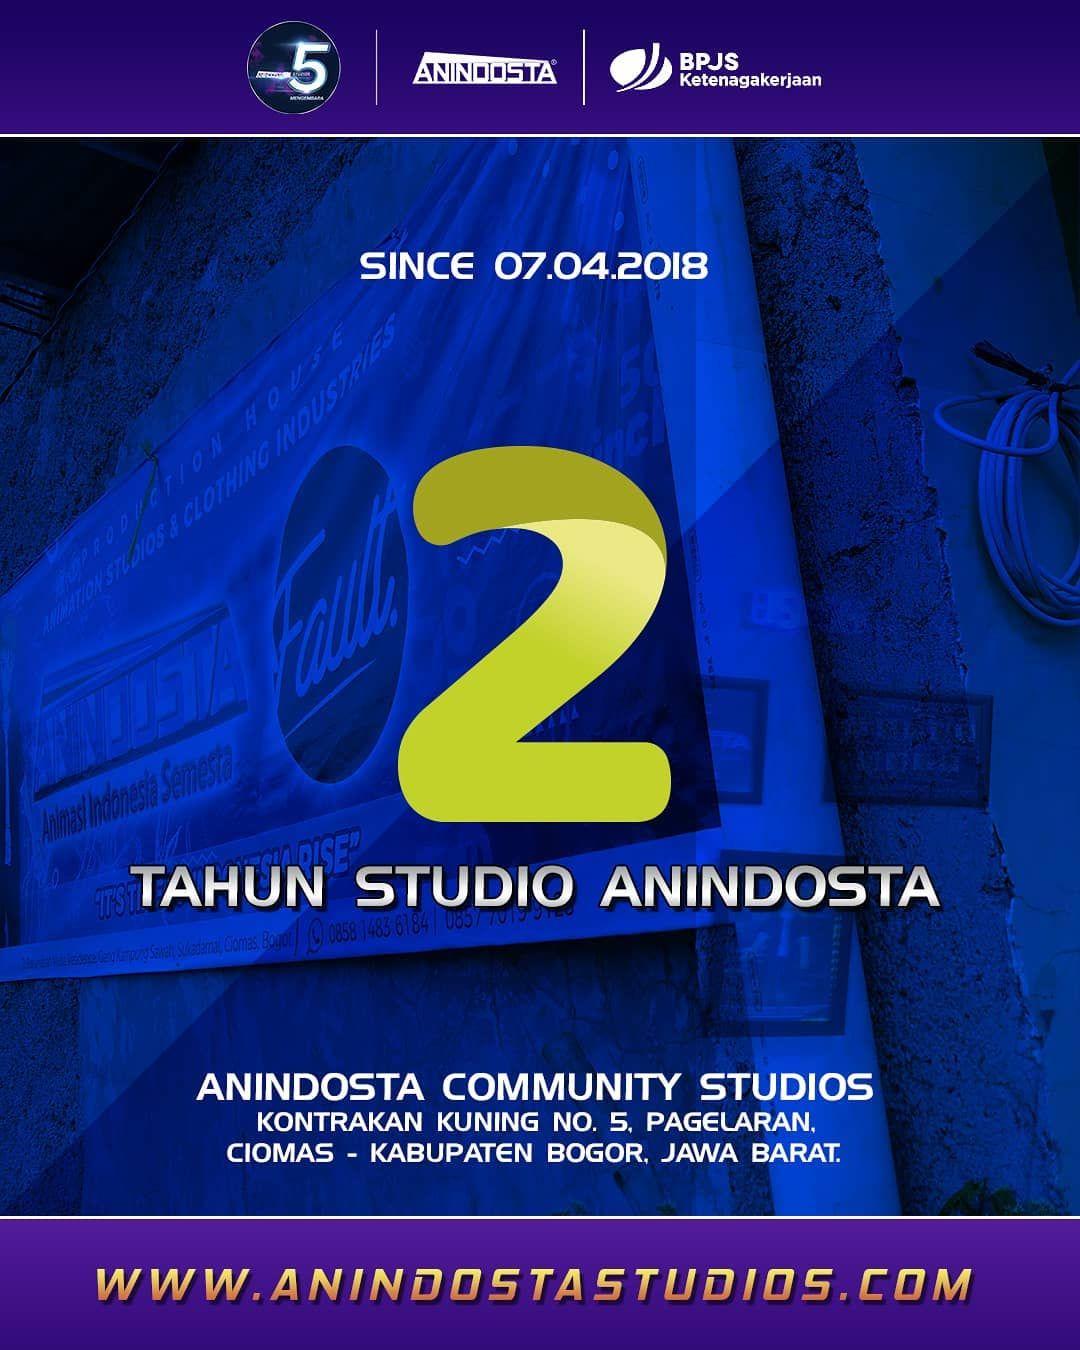 2 Tahun Berlalu Sejak Pertama Kali Kami Mempunyai Sebuah Workspace Sendiri Yang Kami Namai Sebagai Studio Mini Studio Di Kontrakan Kata Harian Nasional Yang Pe